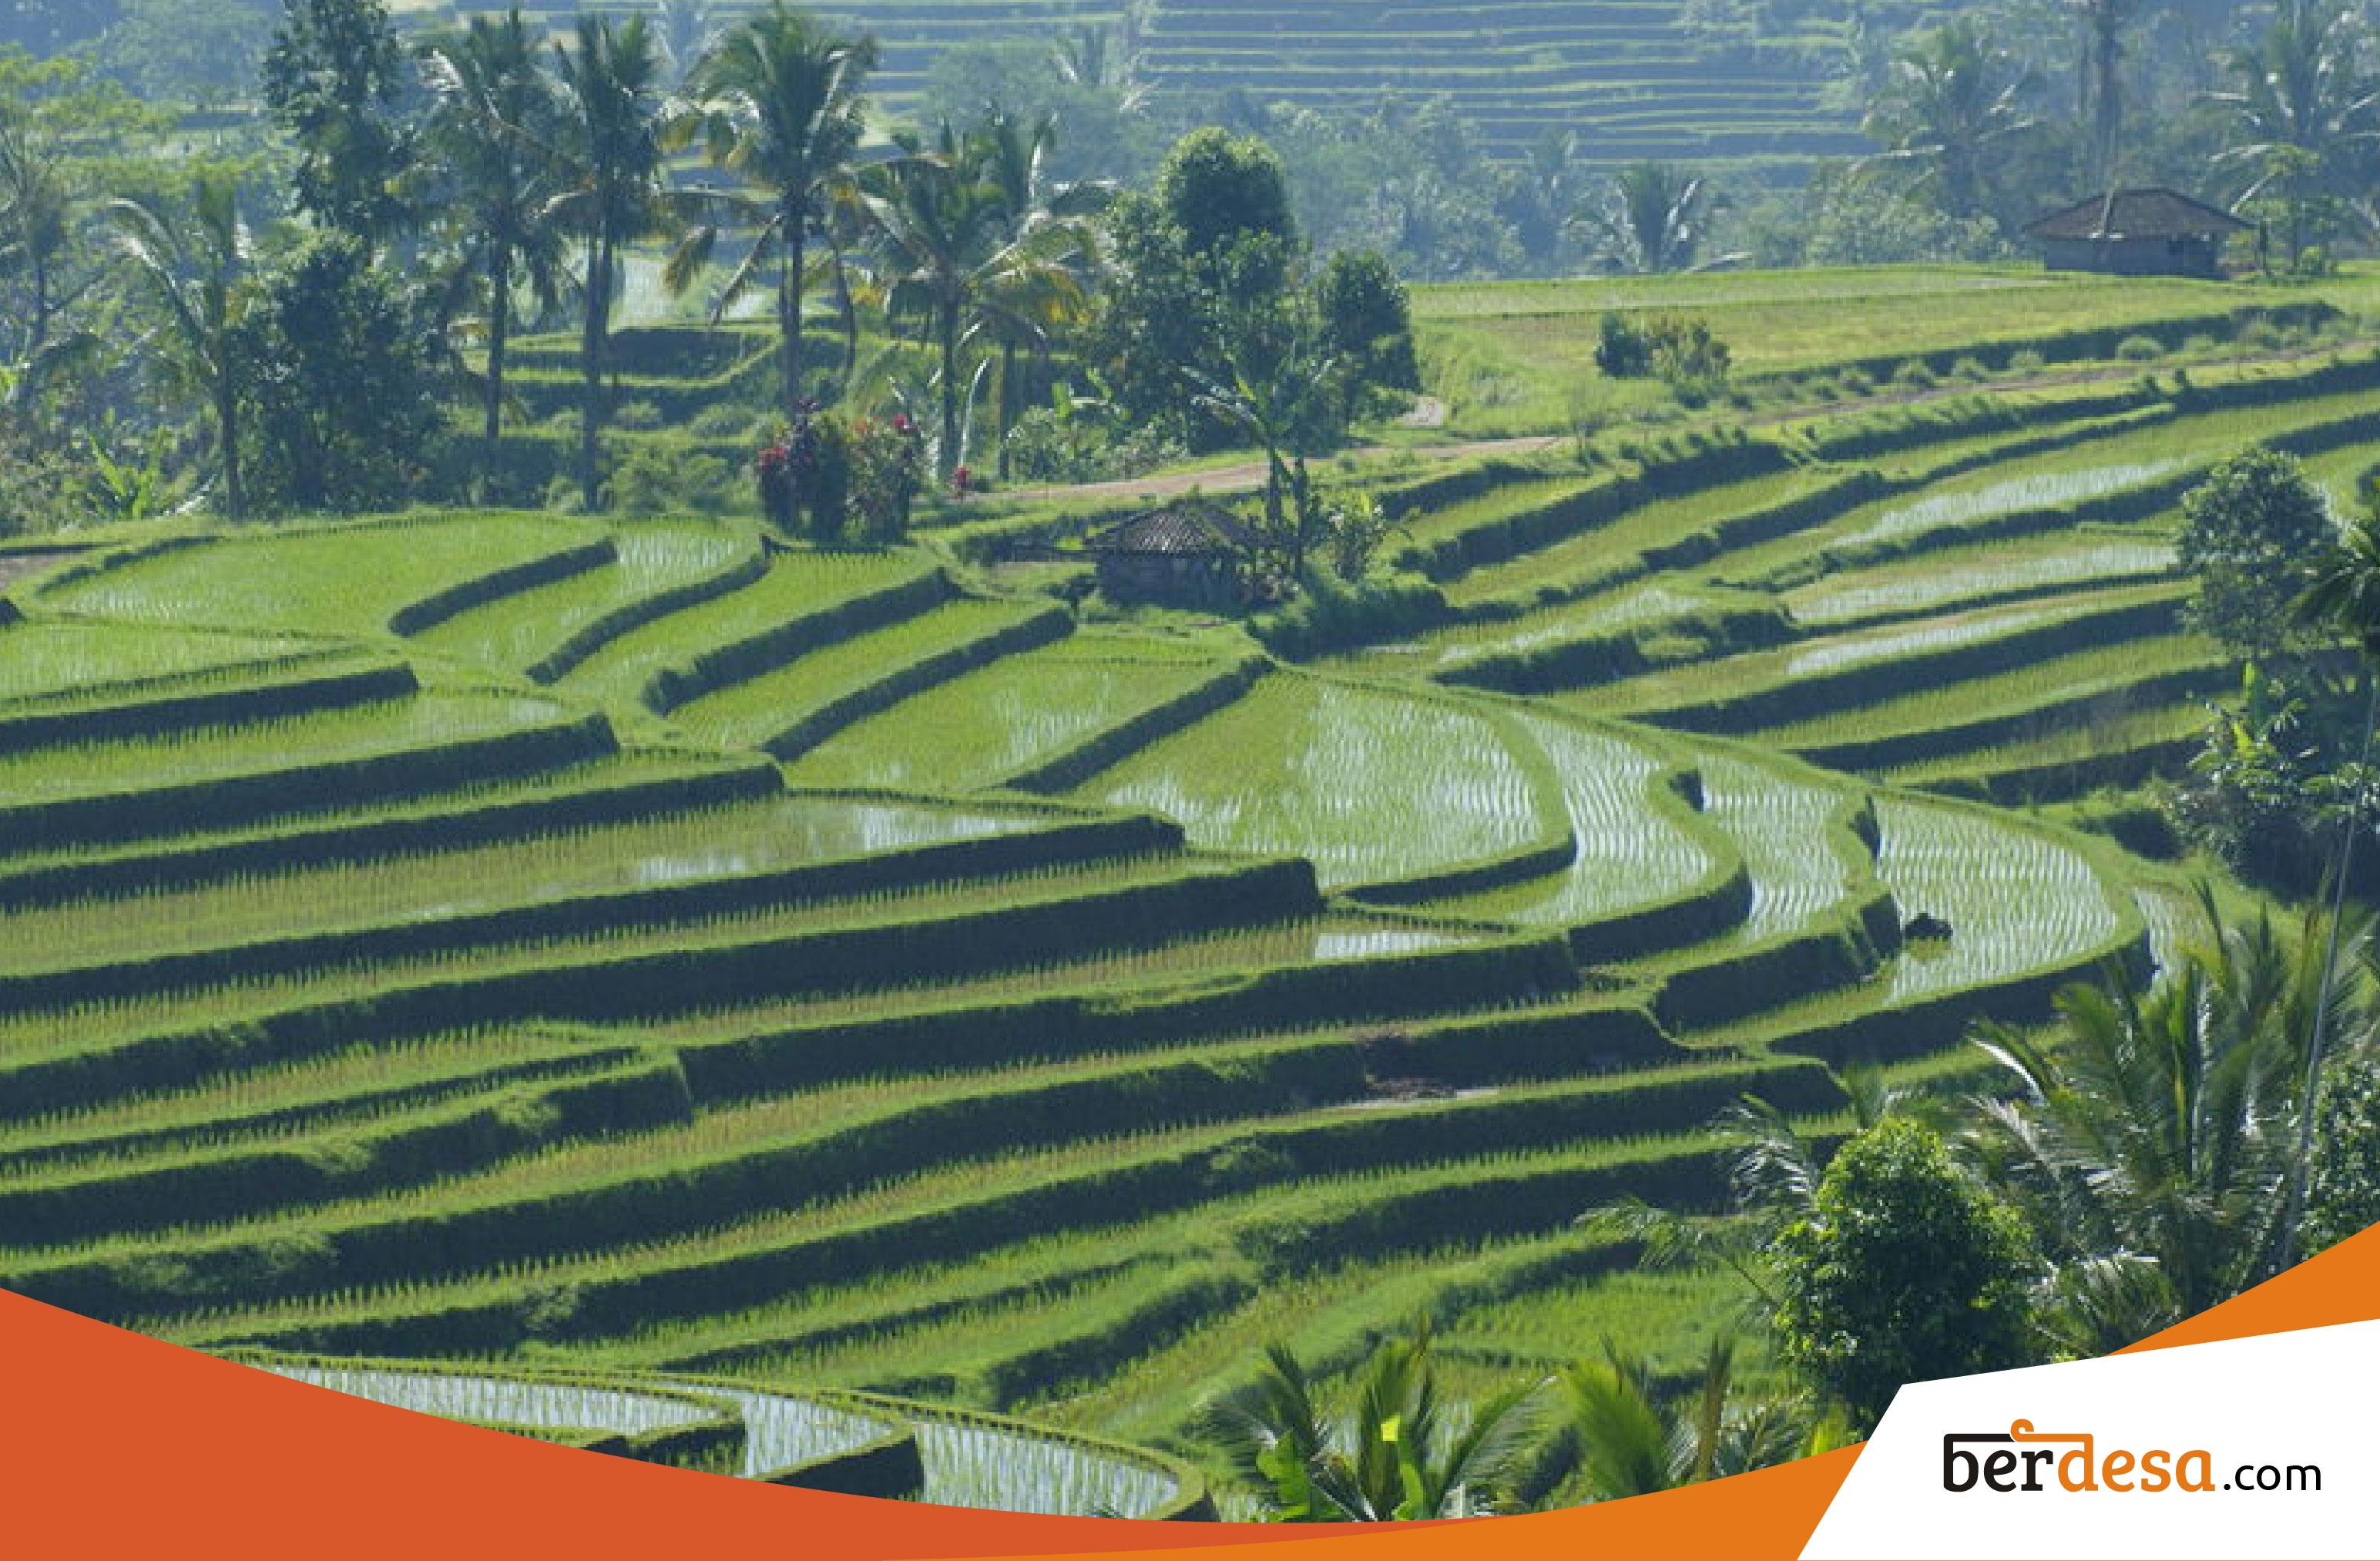 Informasi Mengenai Desain Pertanian Subak Yang Menguntungkan Petani – Berdesa